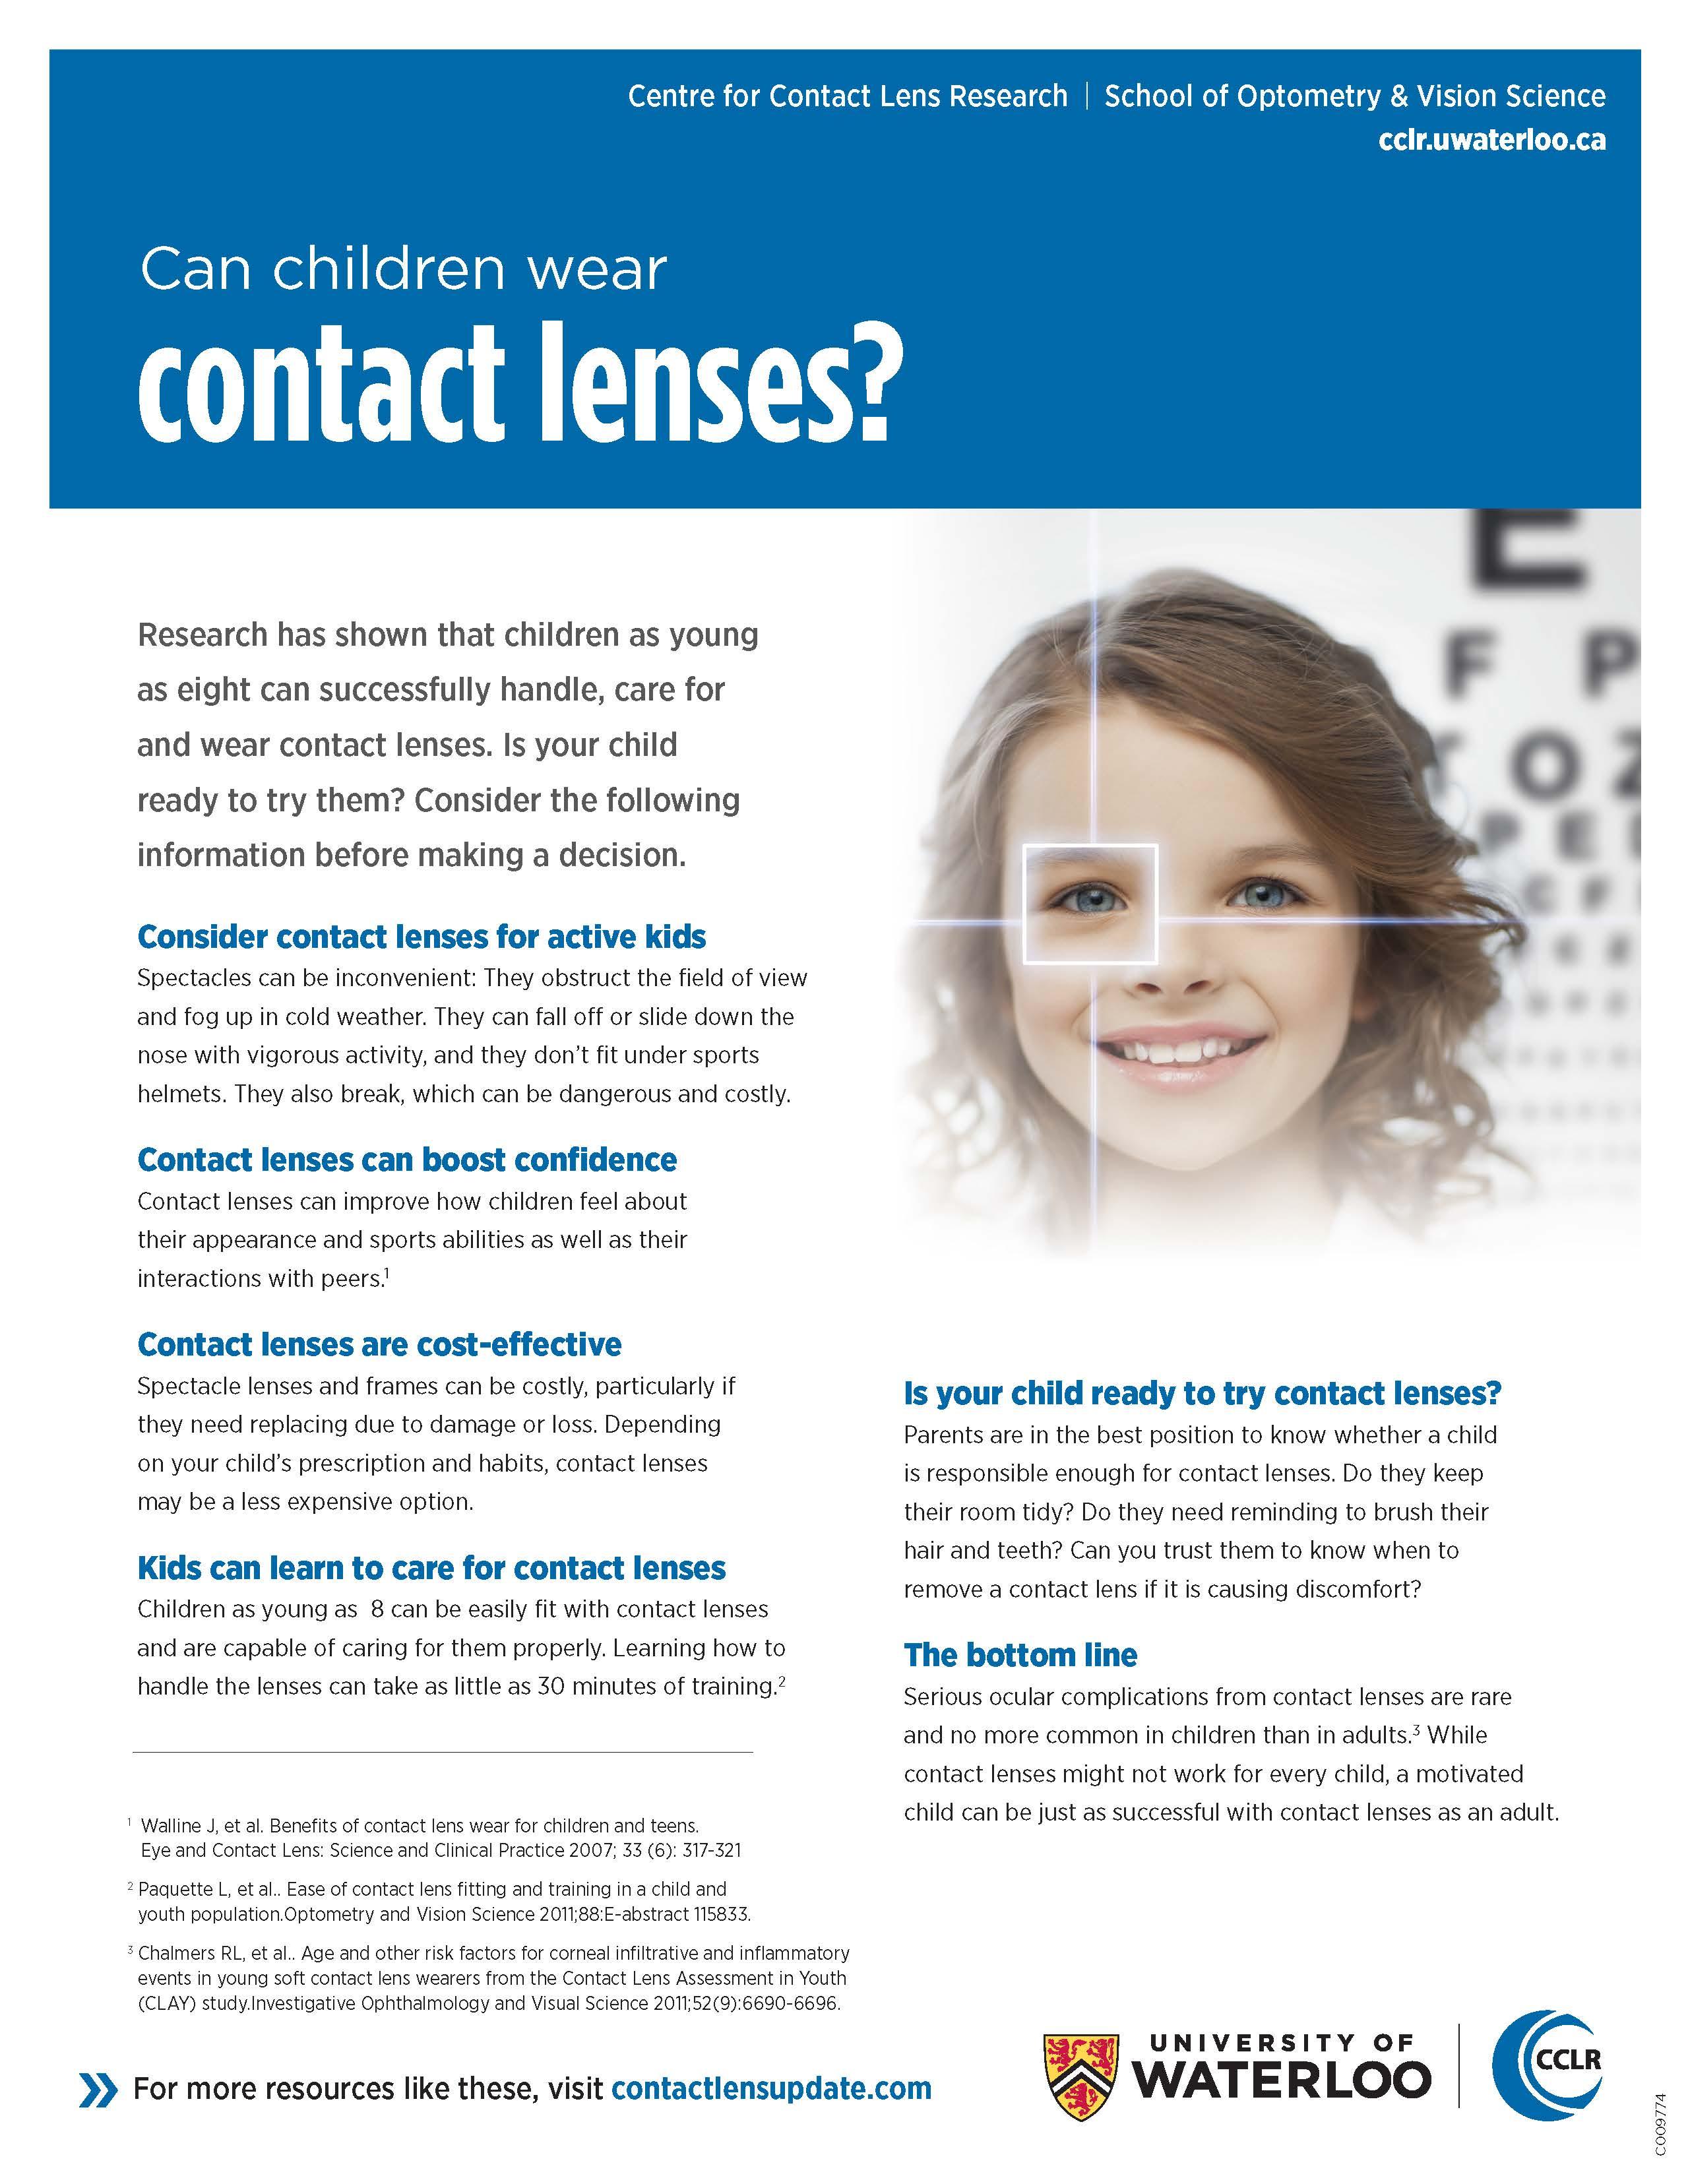 ContactLensUpdate.com - Patient handout - Kids & Contact Lenses